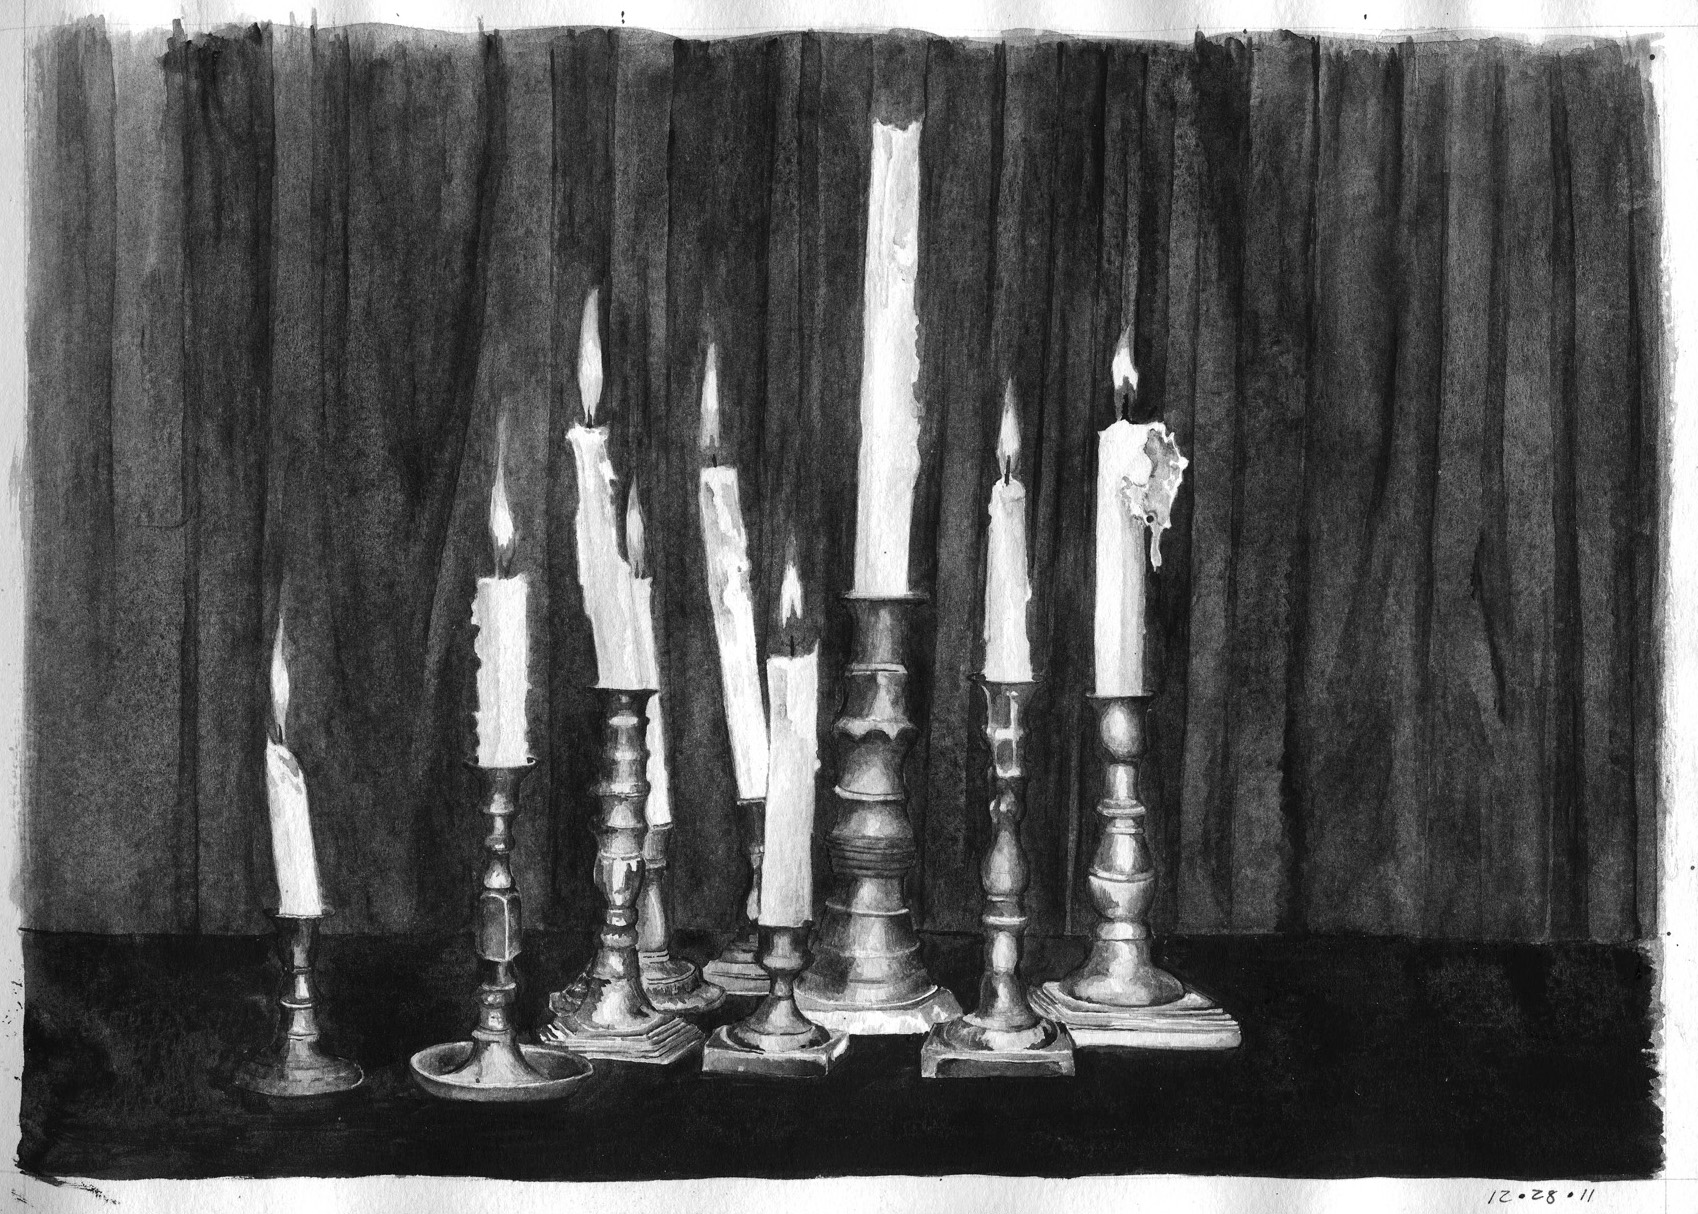 Matthew Rowean - Candles